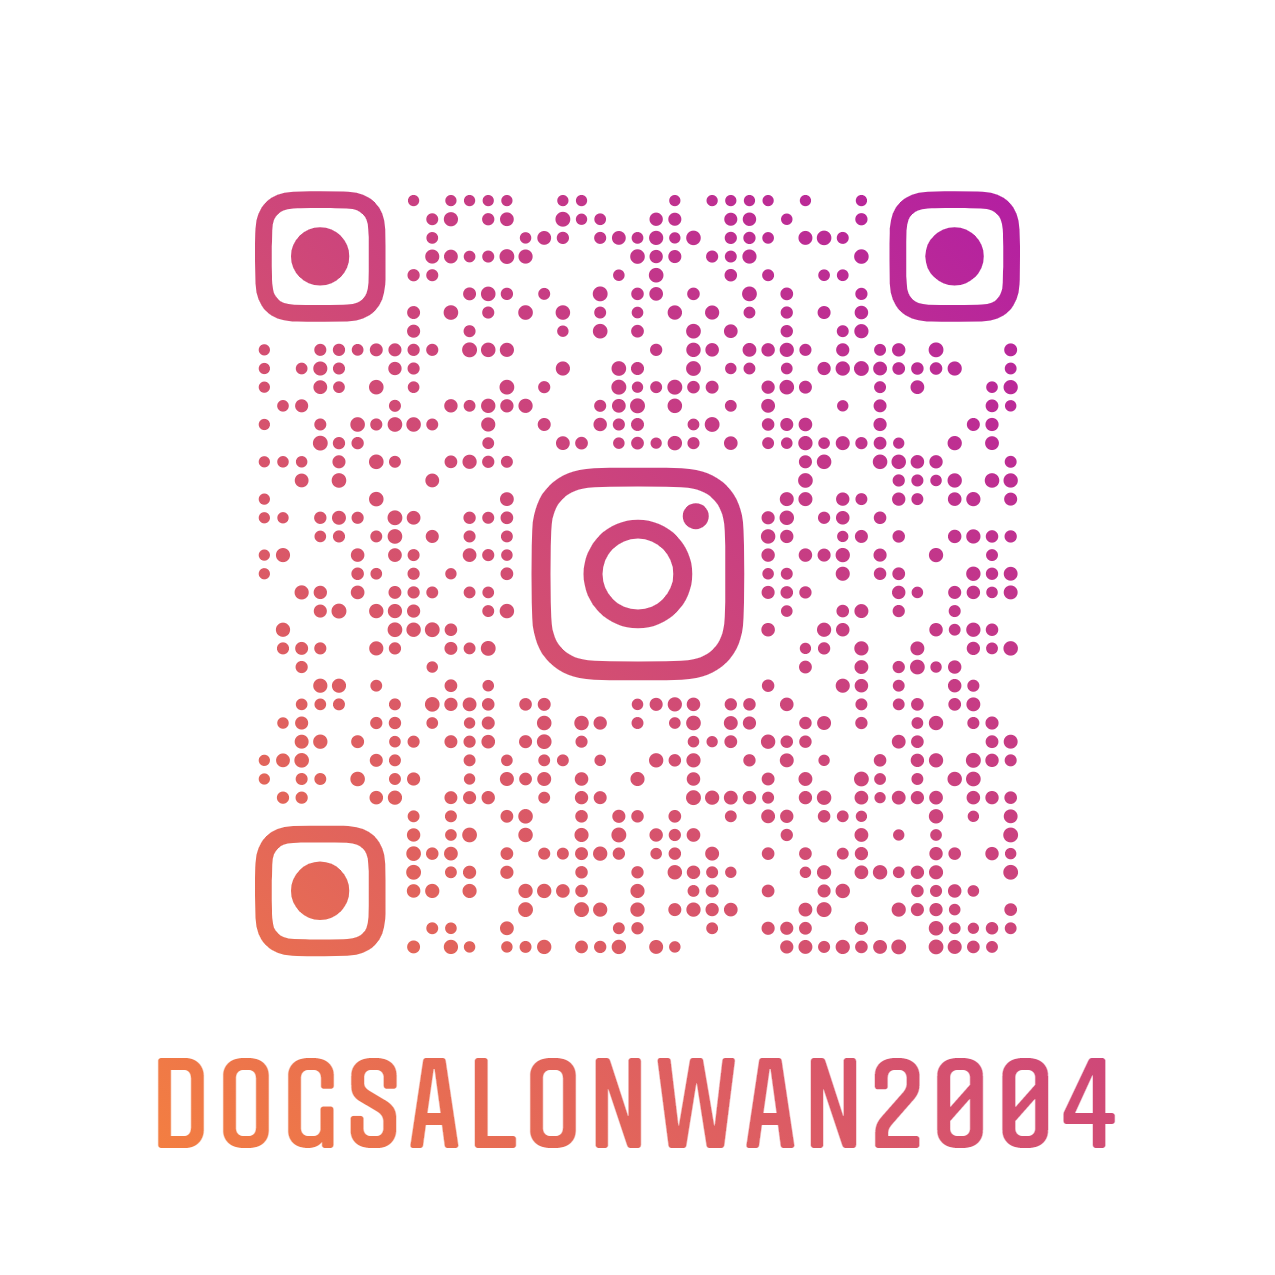 dogsalonwan2004_nametag_2021082913253586e_20210919152004834.png